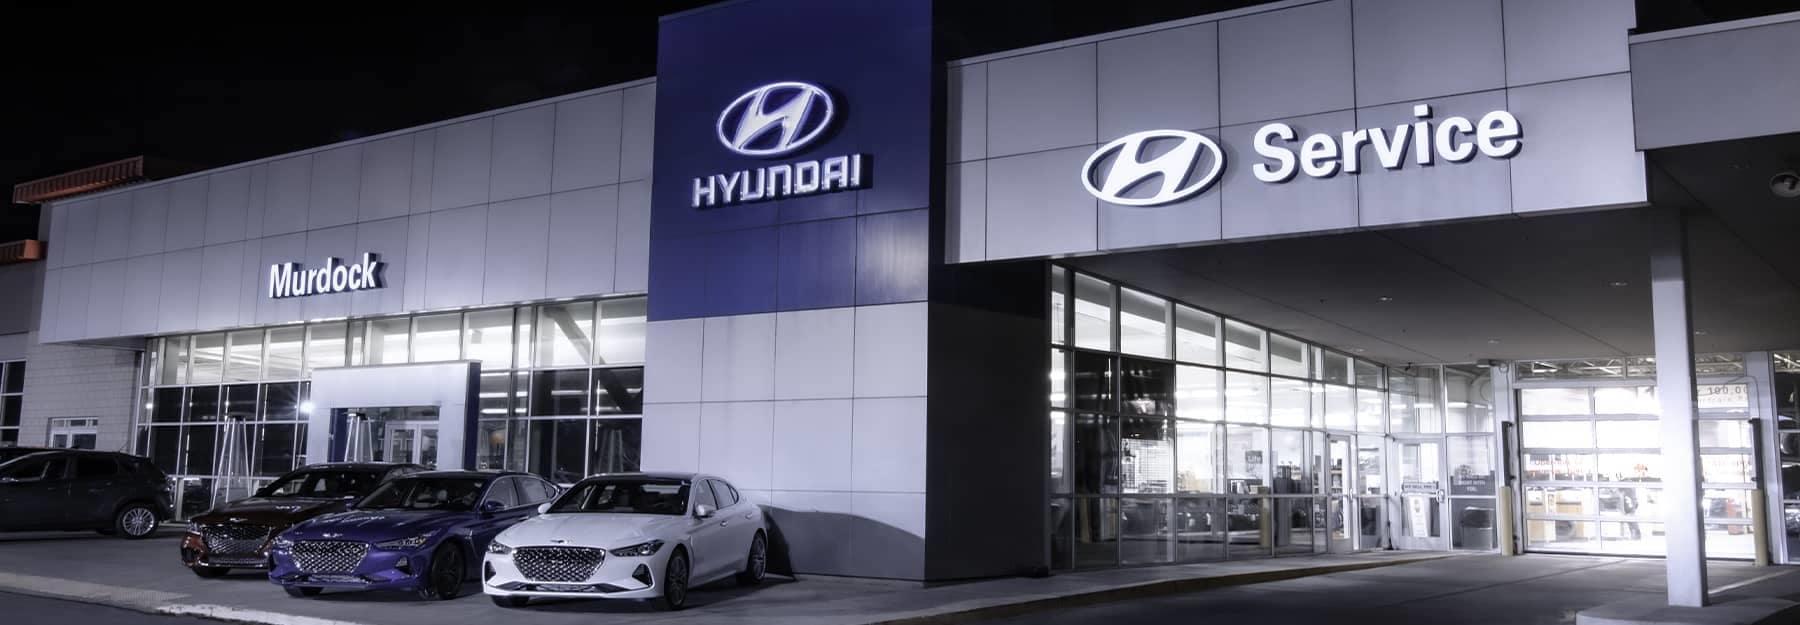 Murdock Hyundai Lindon - Dealer Inspire